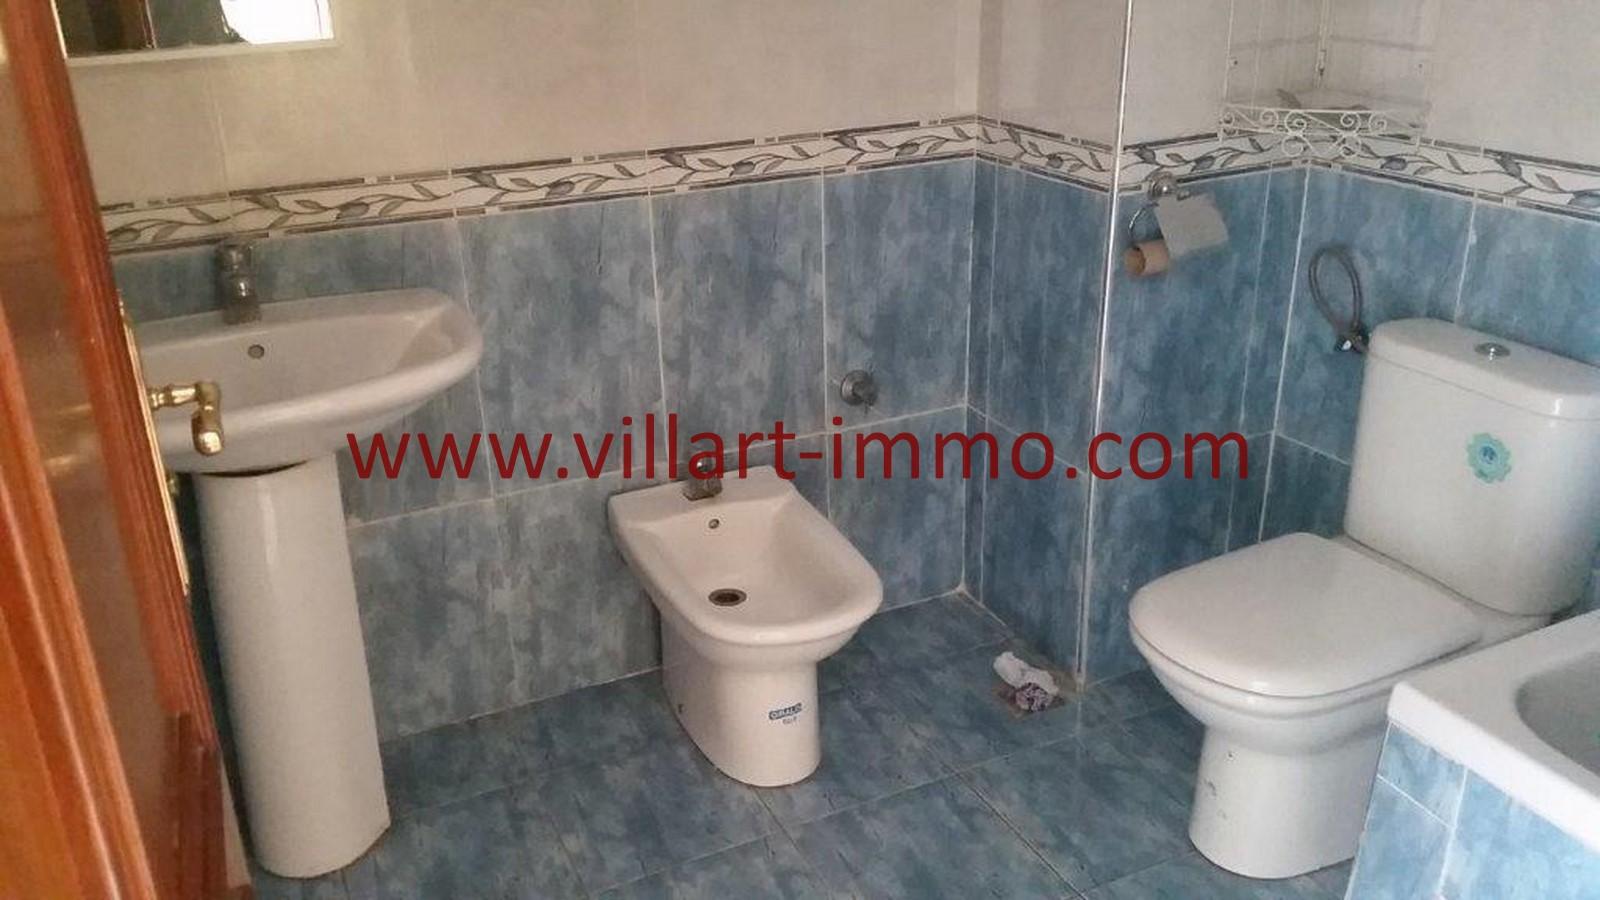 12-A louer-Tanger-Appartement-Non meublée-Centre ville-Salle de bain-L1029